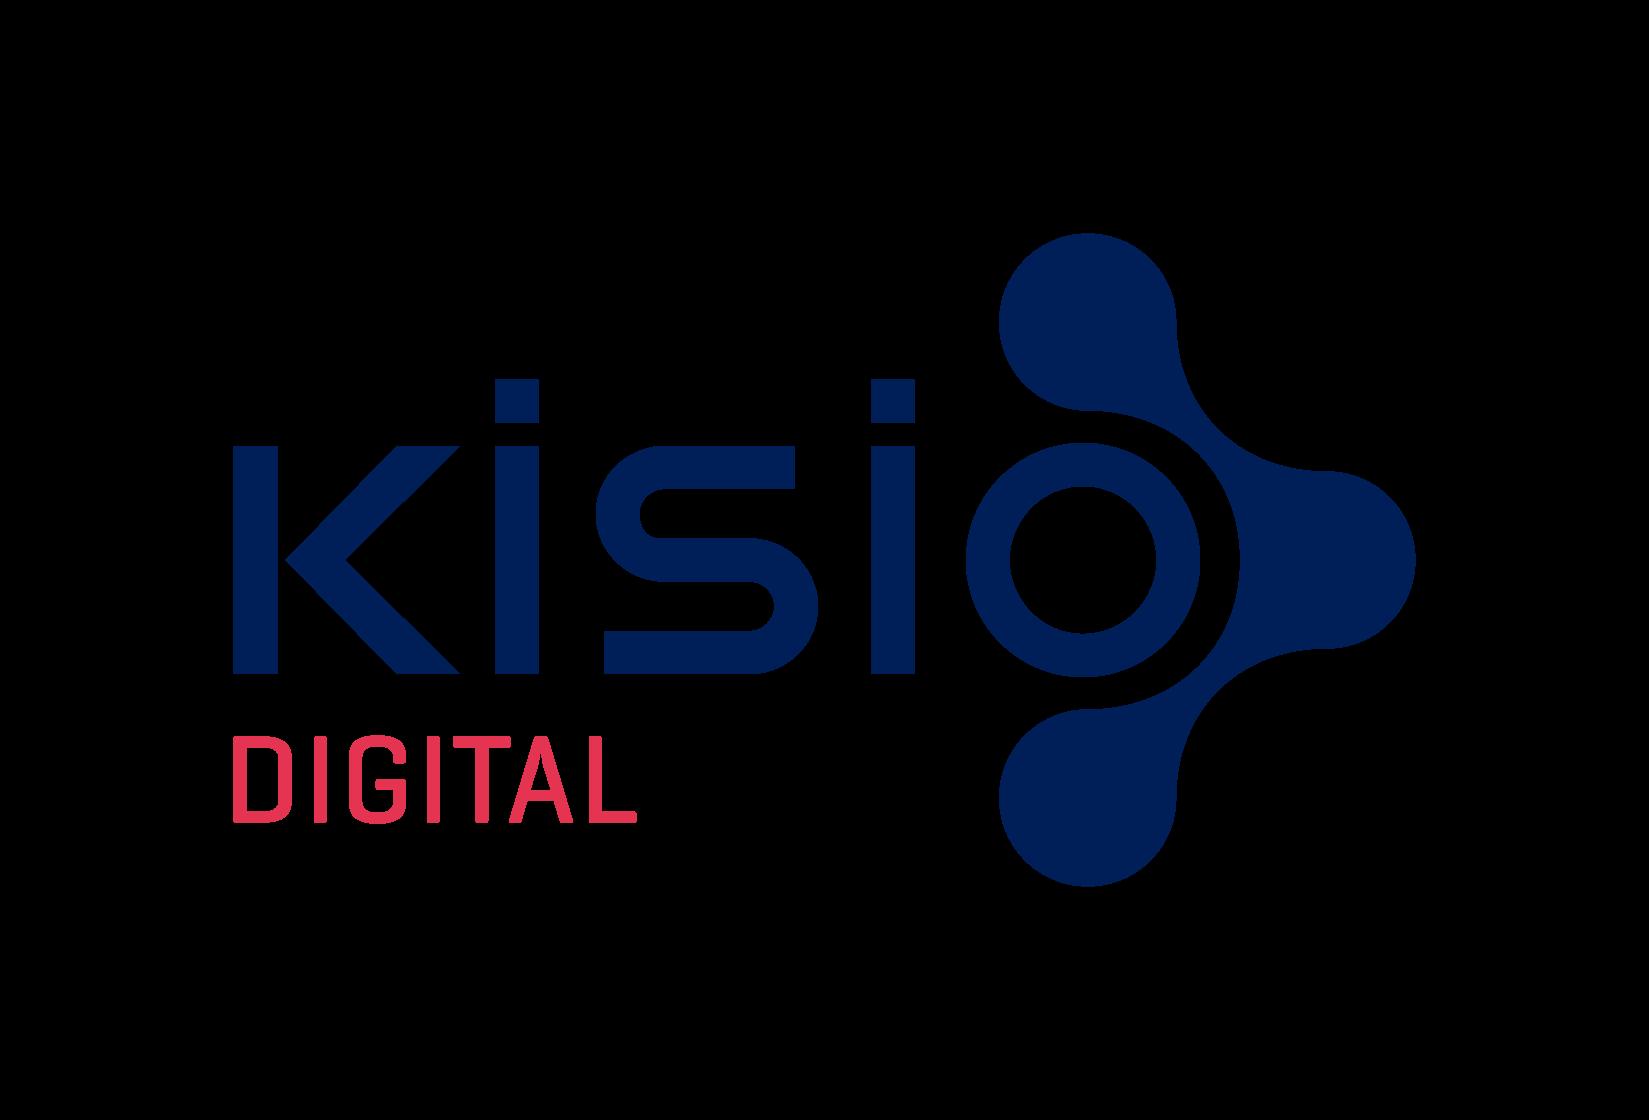 Kisio+digital.png